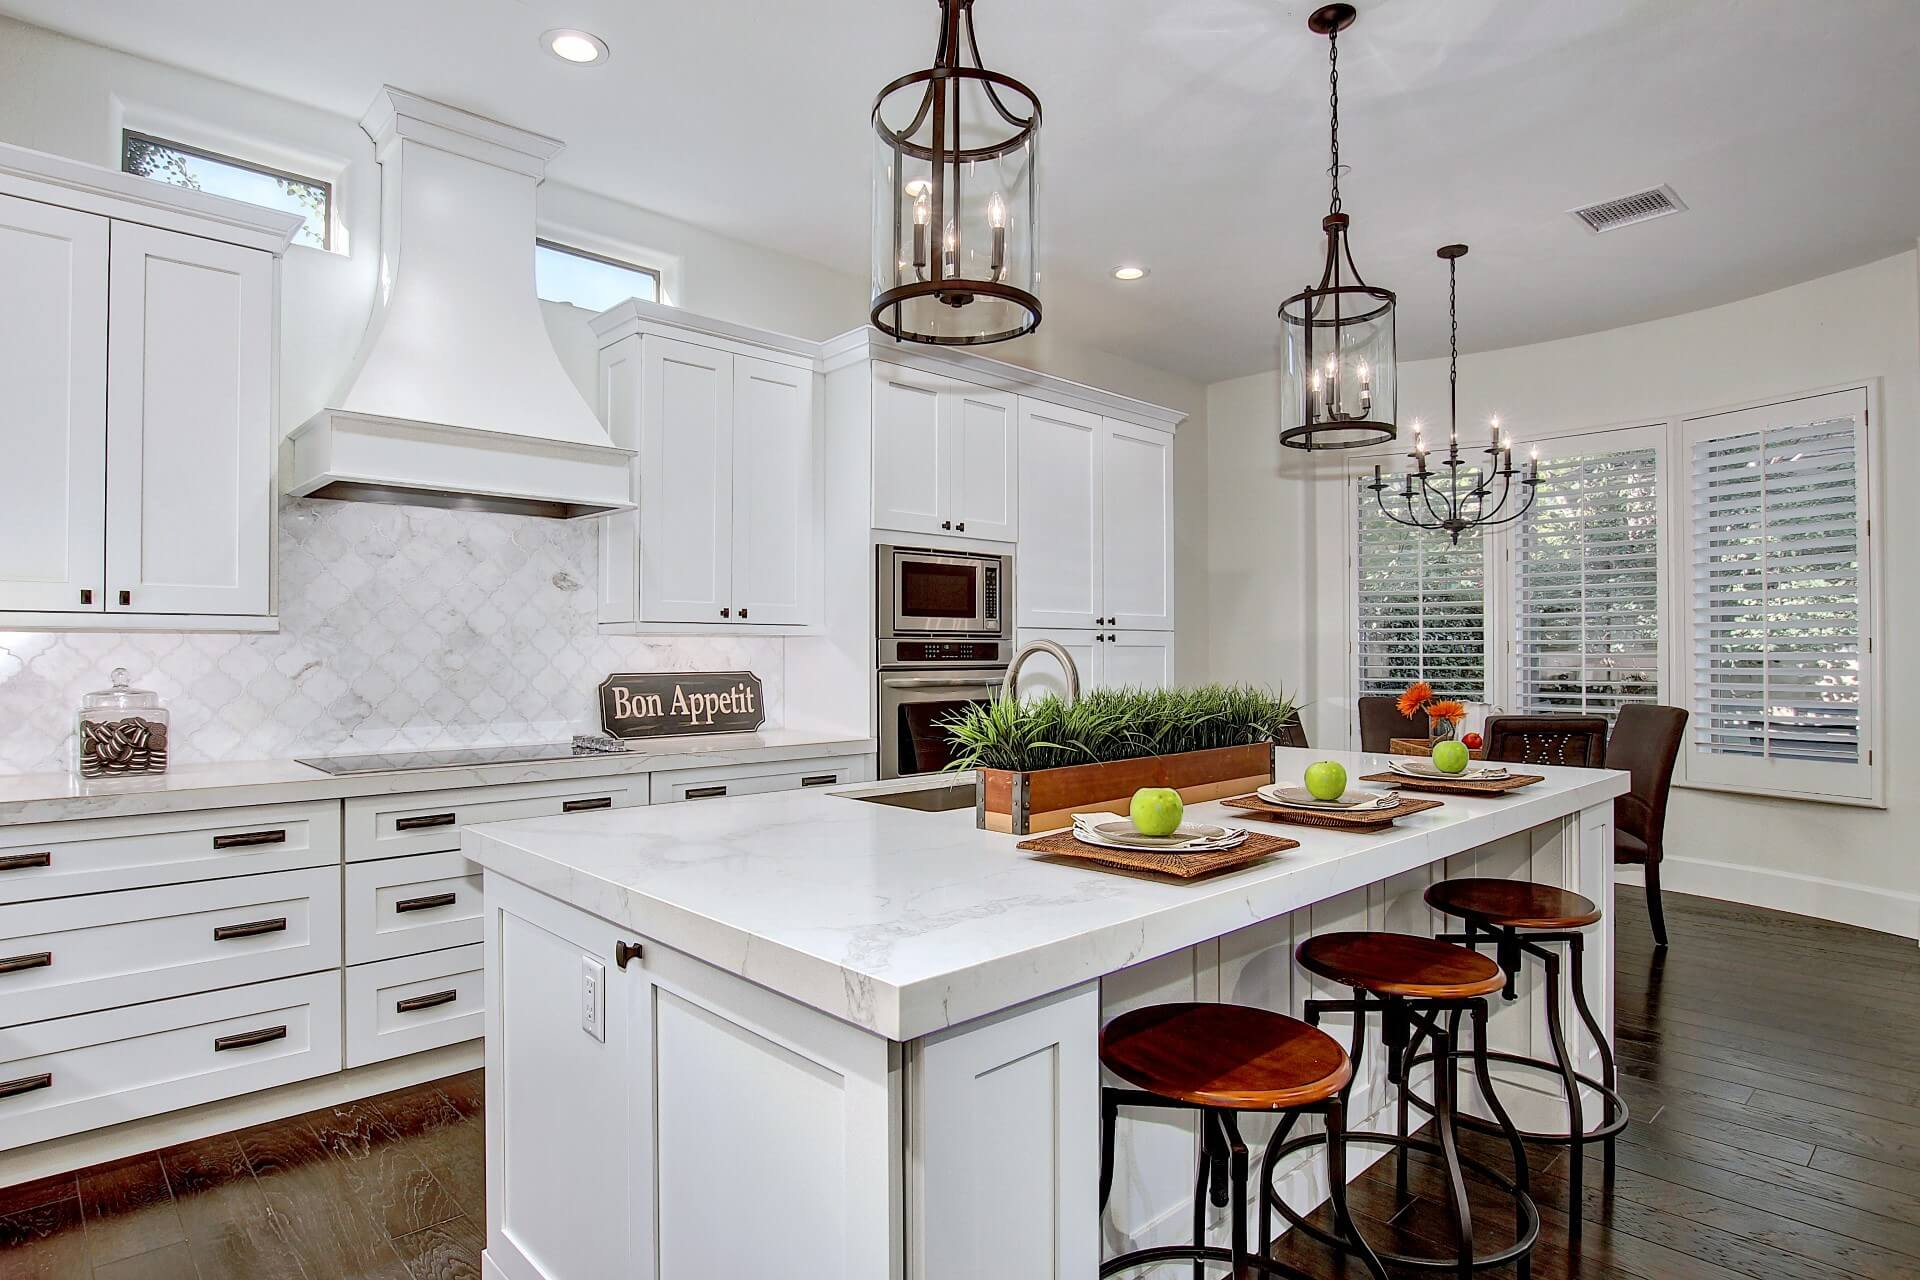 Kitchen Cabinets Showroom in Scottsdale AZ